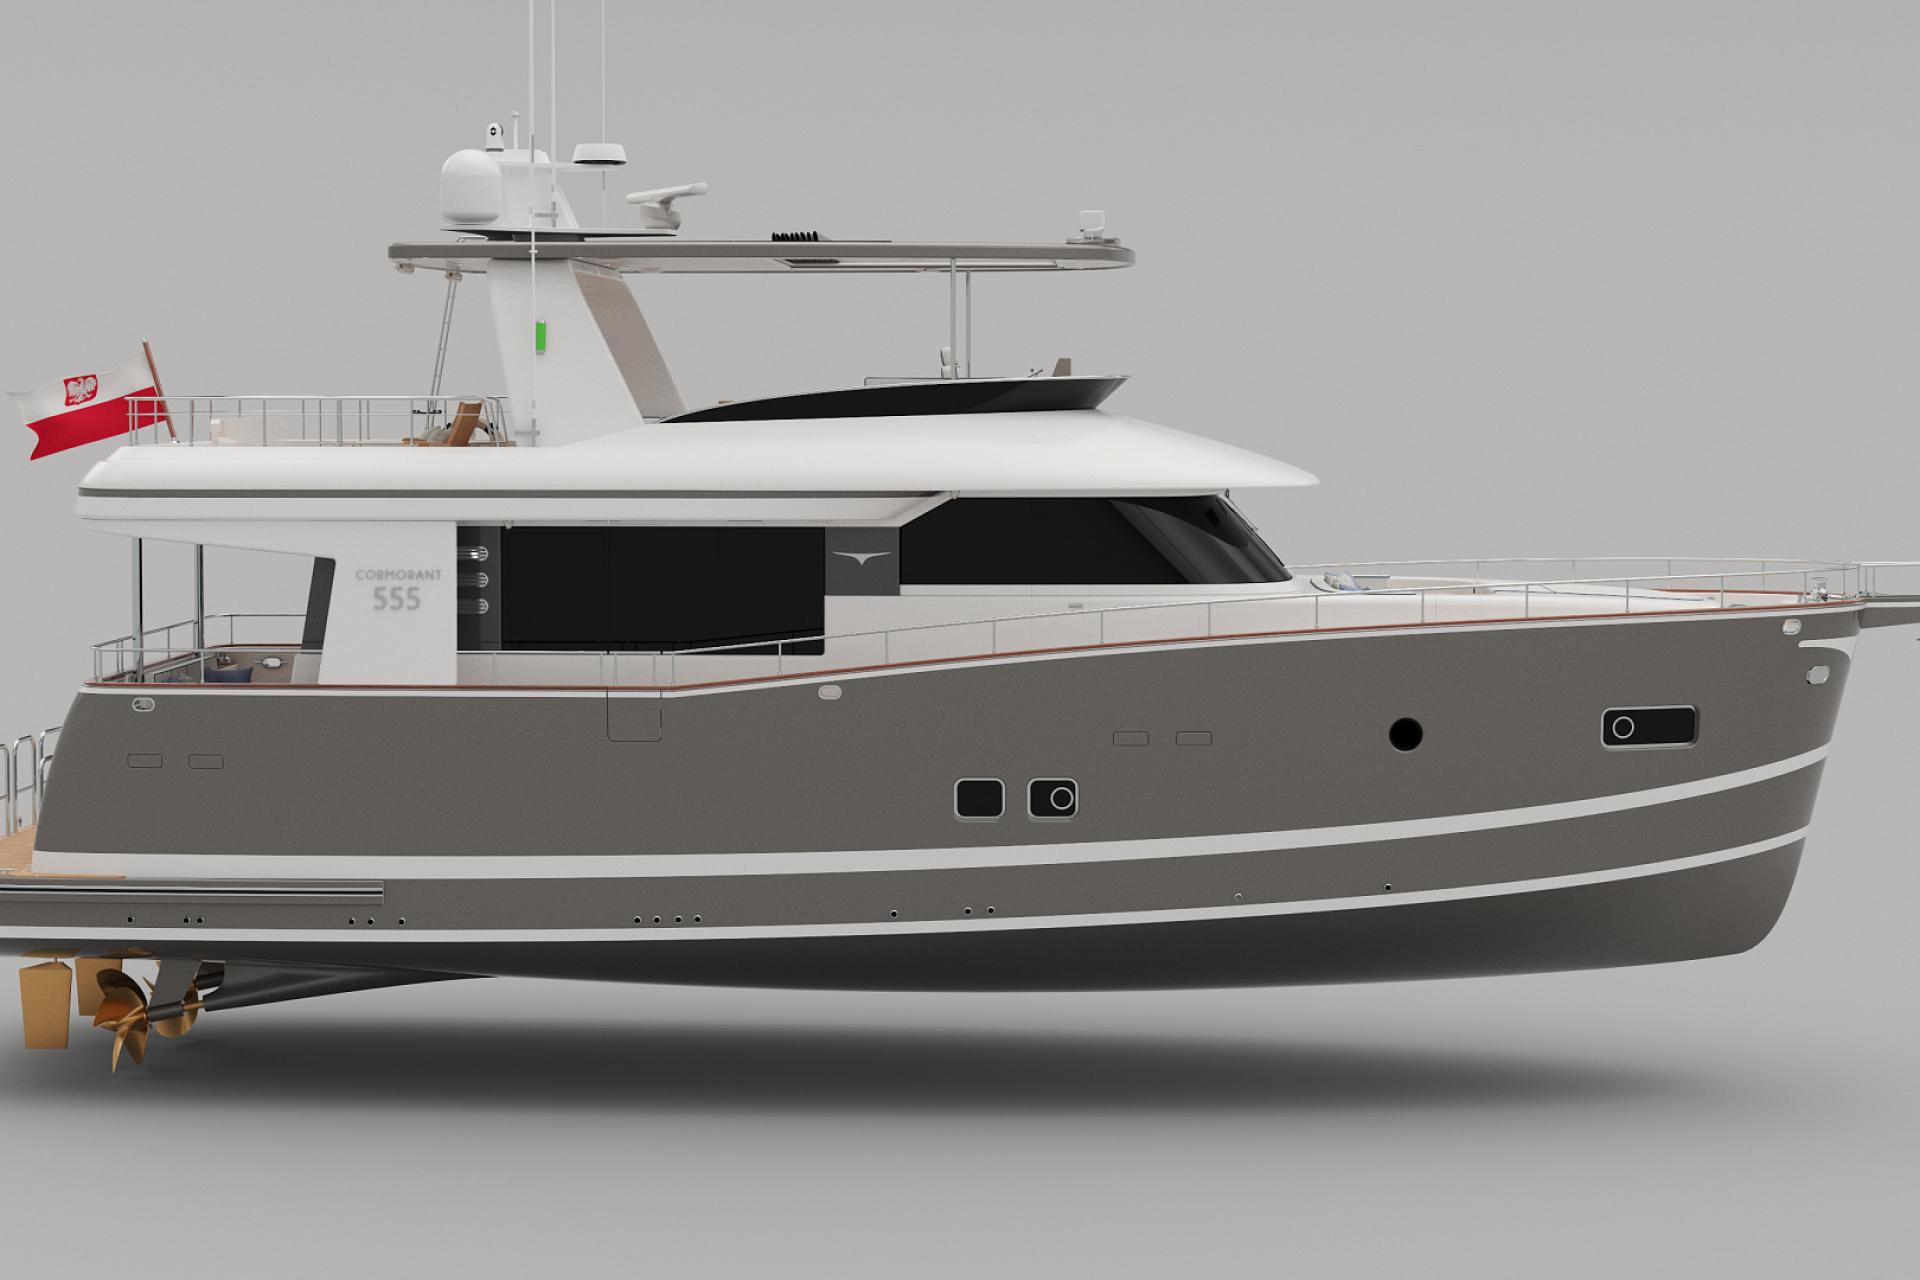 COR555 Starboard side